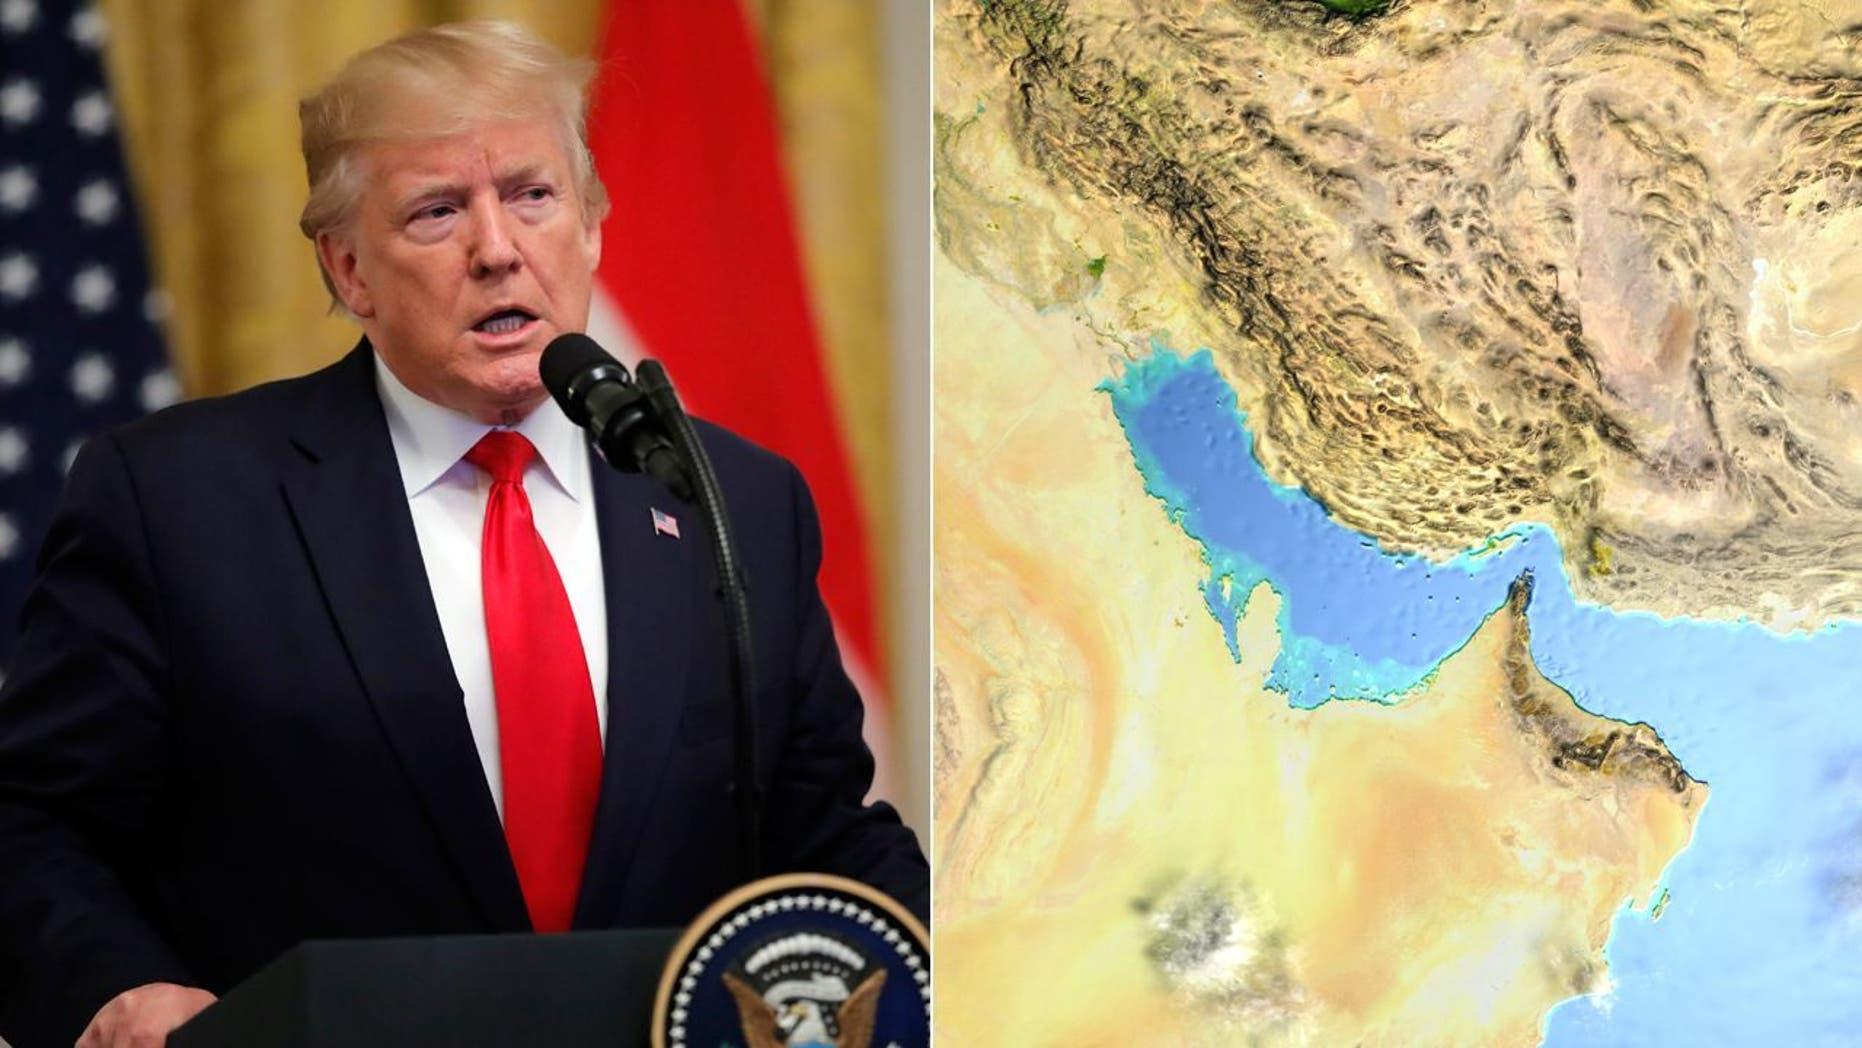 Westlake Legal Group TrumpIran071919 Iran denies US shot down Iranian drone; Ilhan Omar's anti-Israel resolution sparks outrage fox-news/columns/fox-news-first fox news fnc/us fnc article 9c22061c-5219-5f6f-a17b-dd3ae44791f4